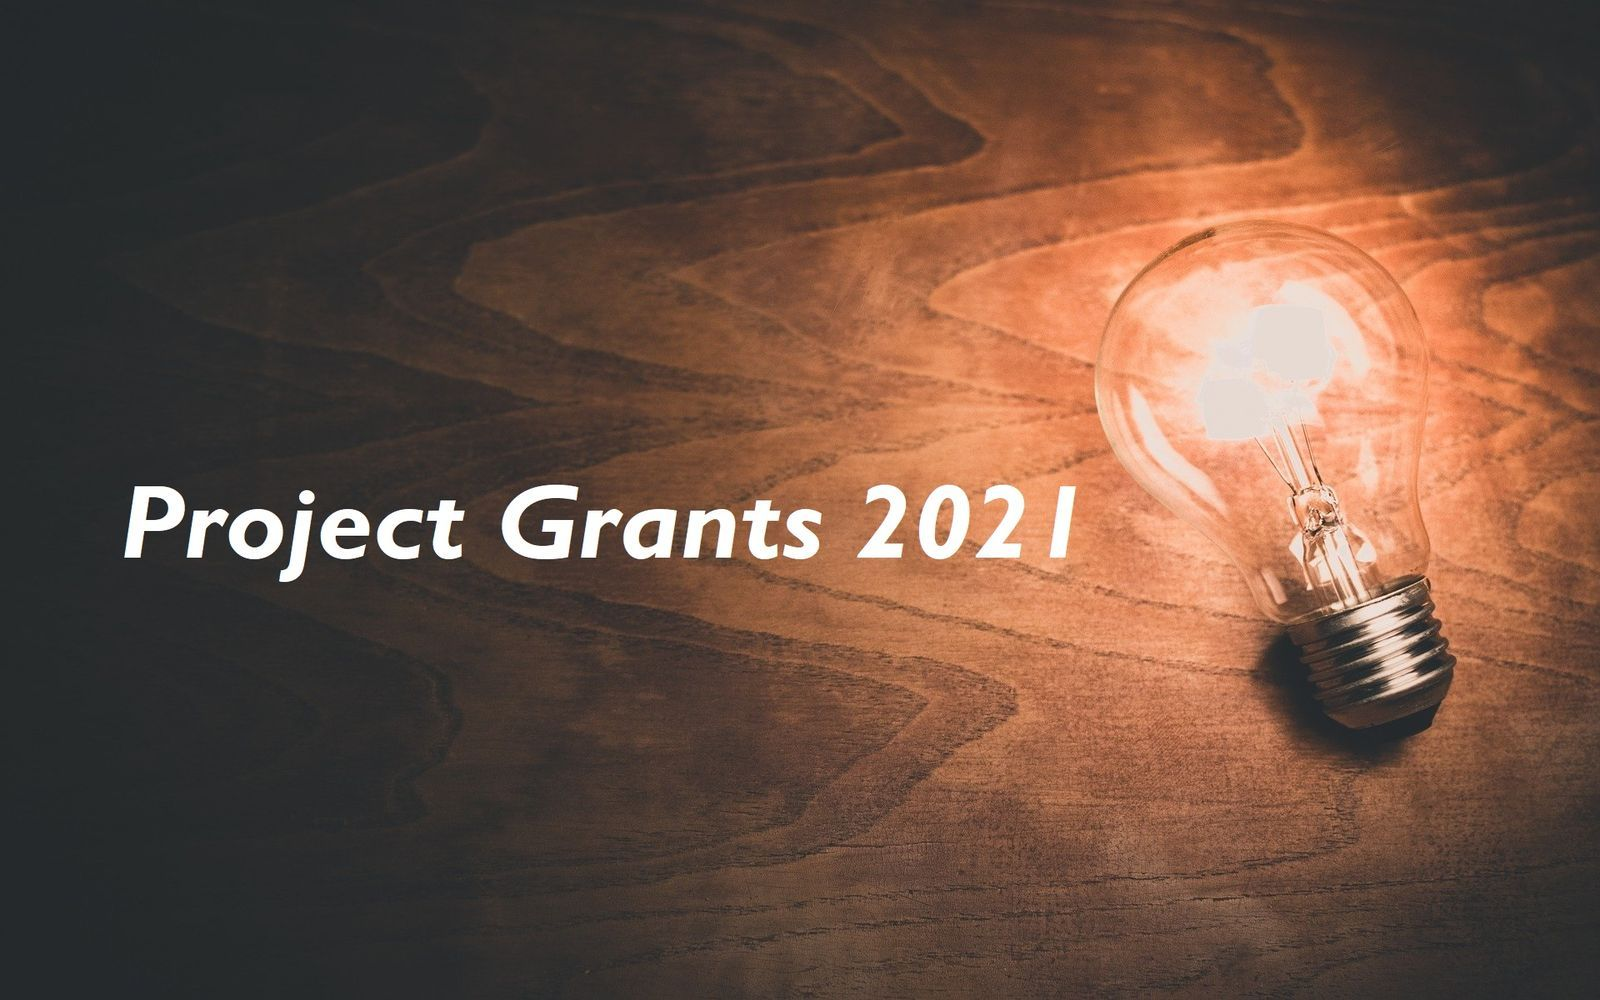 Project Grants 2021